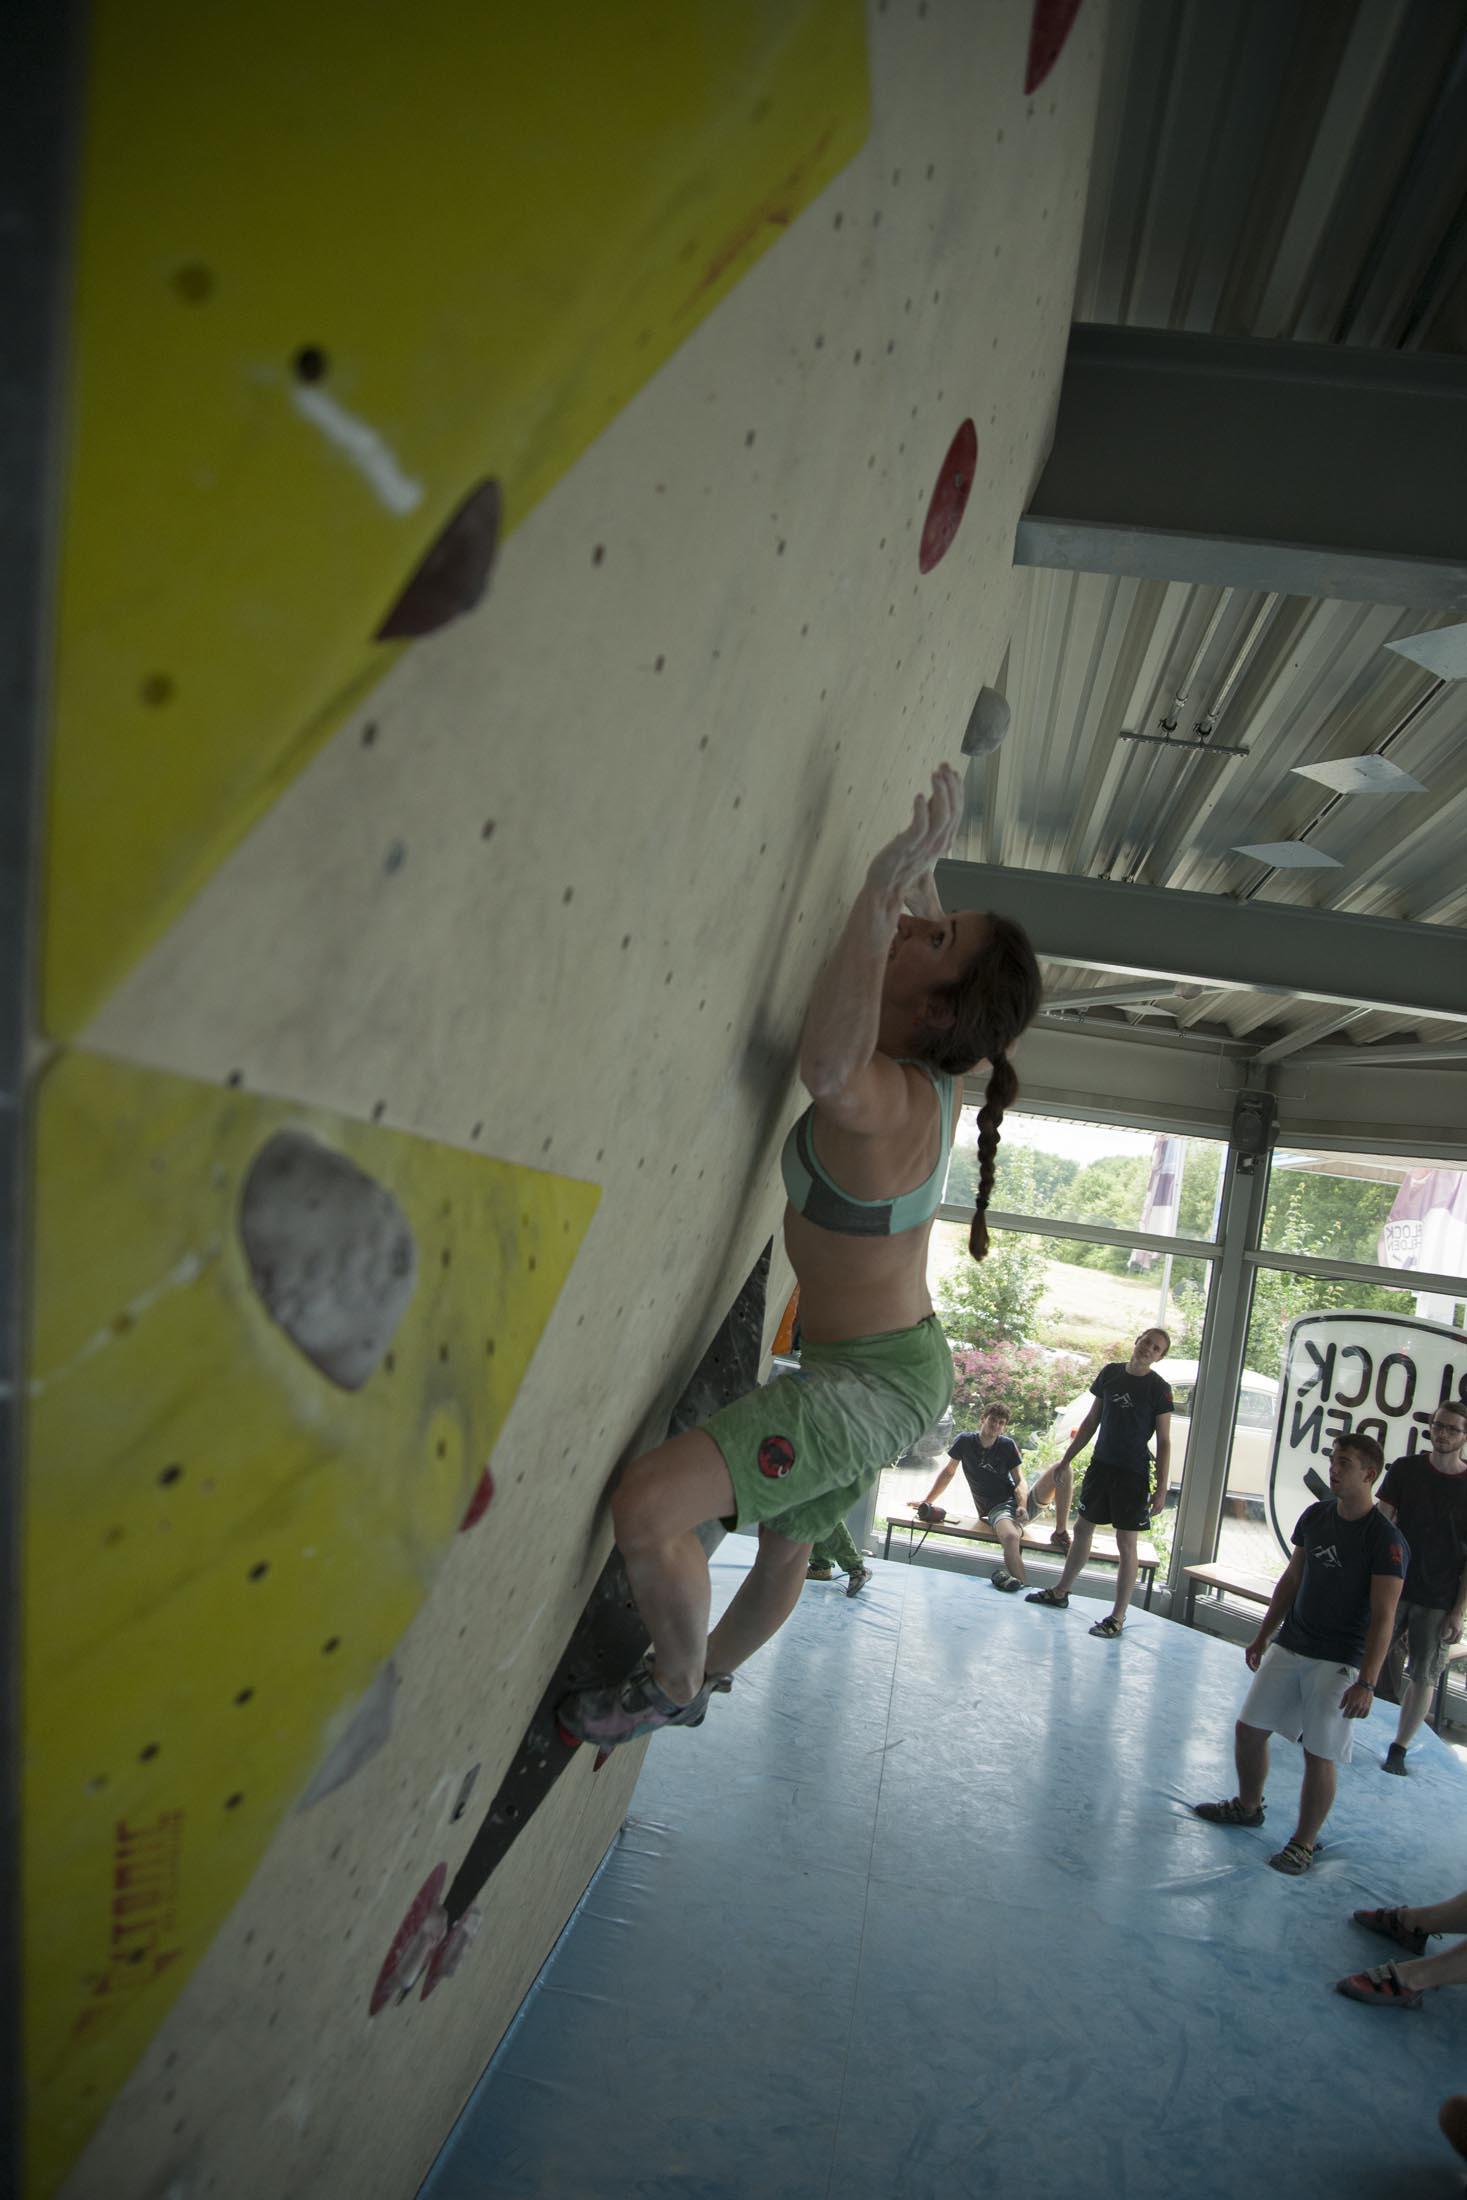 Quali, internationaler bouldercup Frankenjura 2016, BLOCKHELDEN Erlangen, Mammut, Bergfreunde.de, Boulderwettkampf07092016338